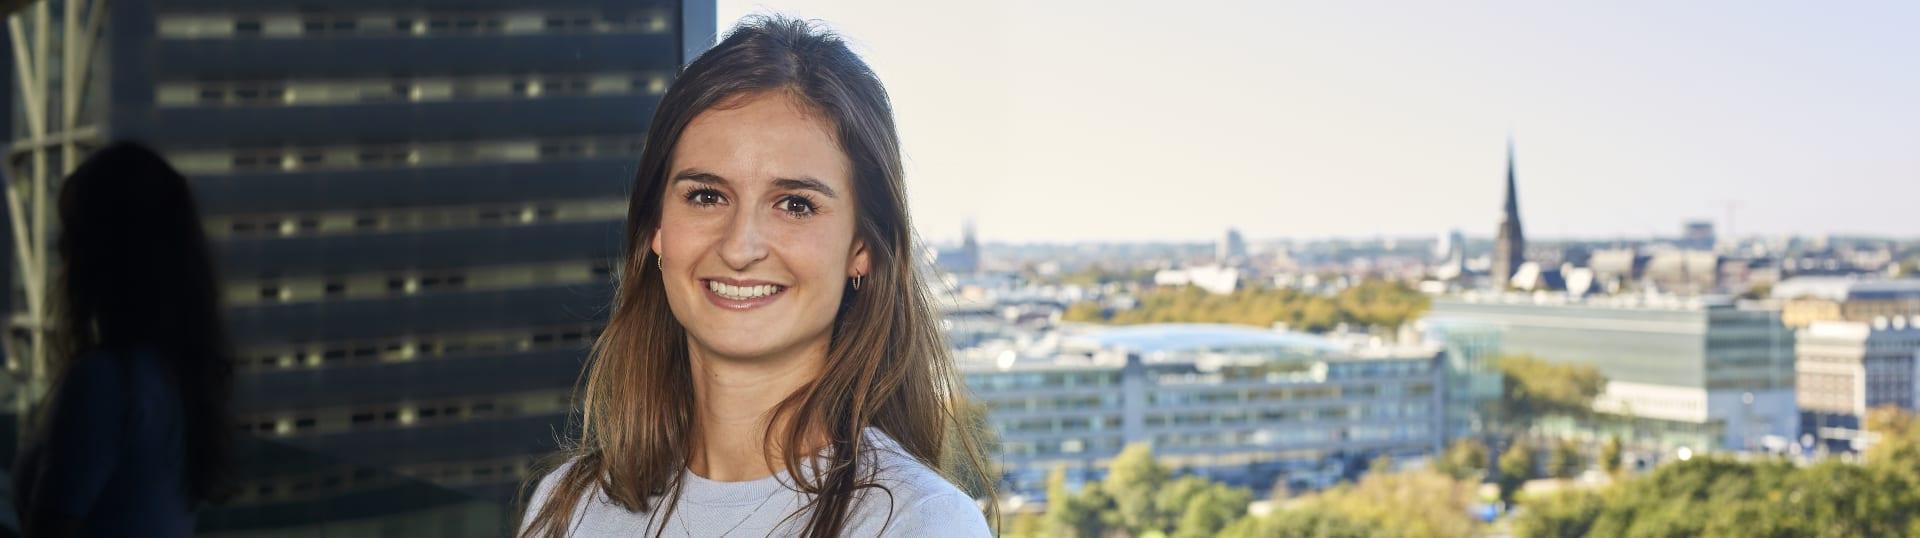 Cathrien Sickler, advocaat Pels Rijcken